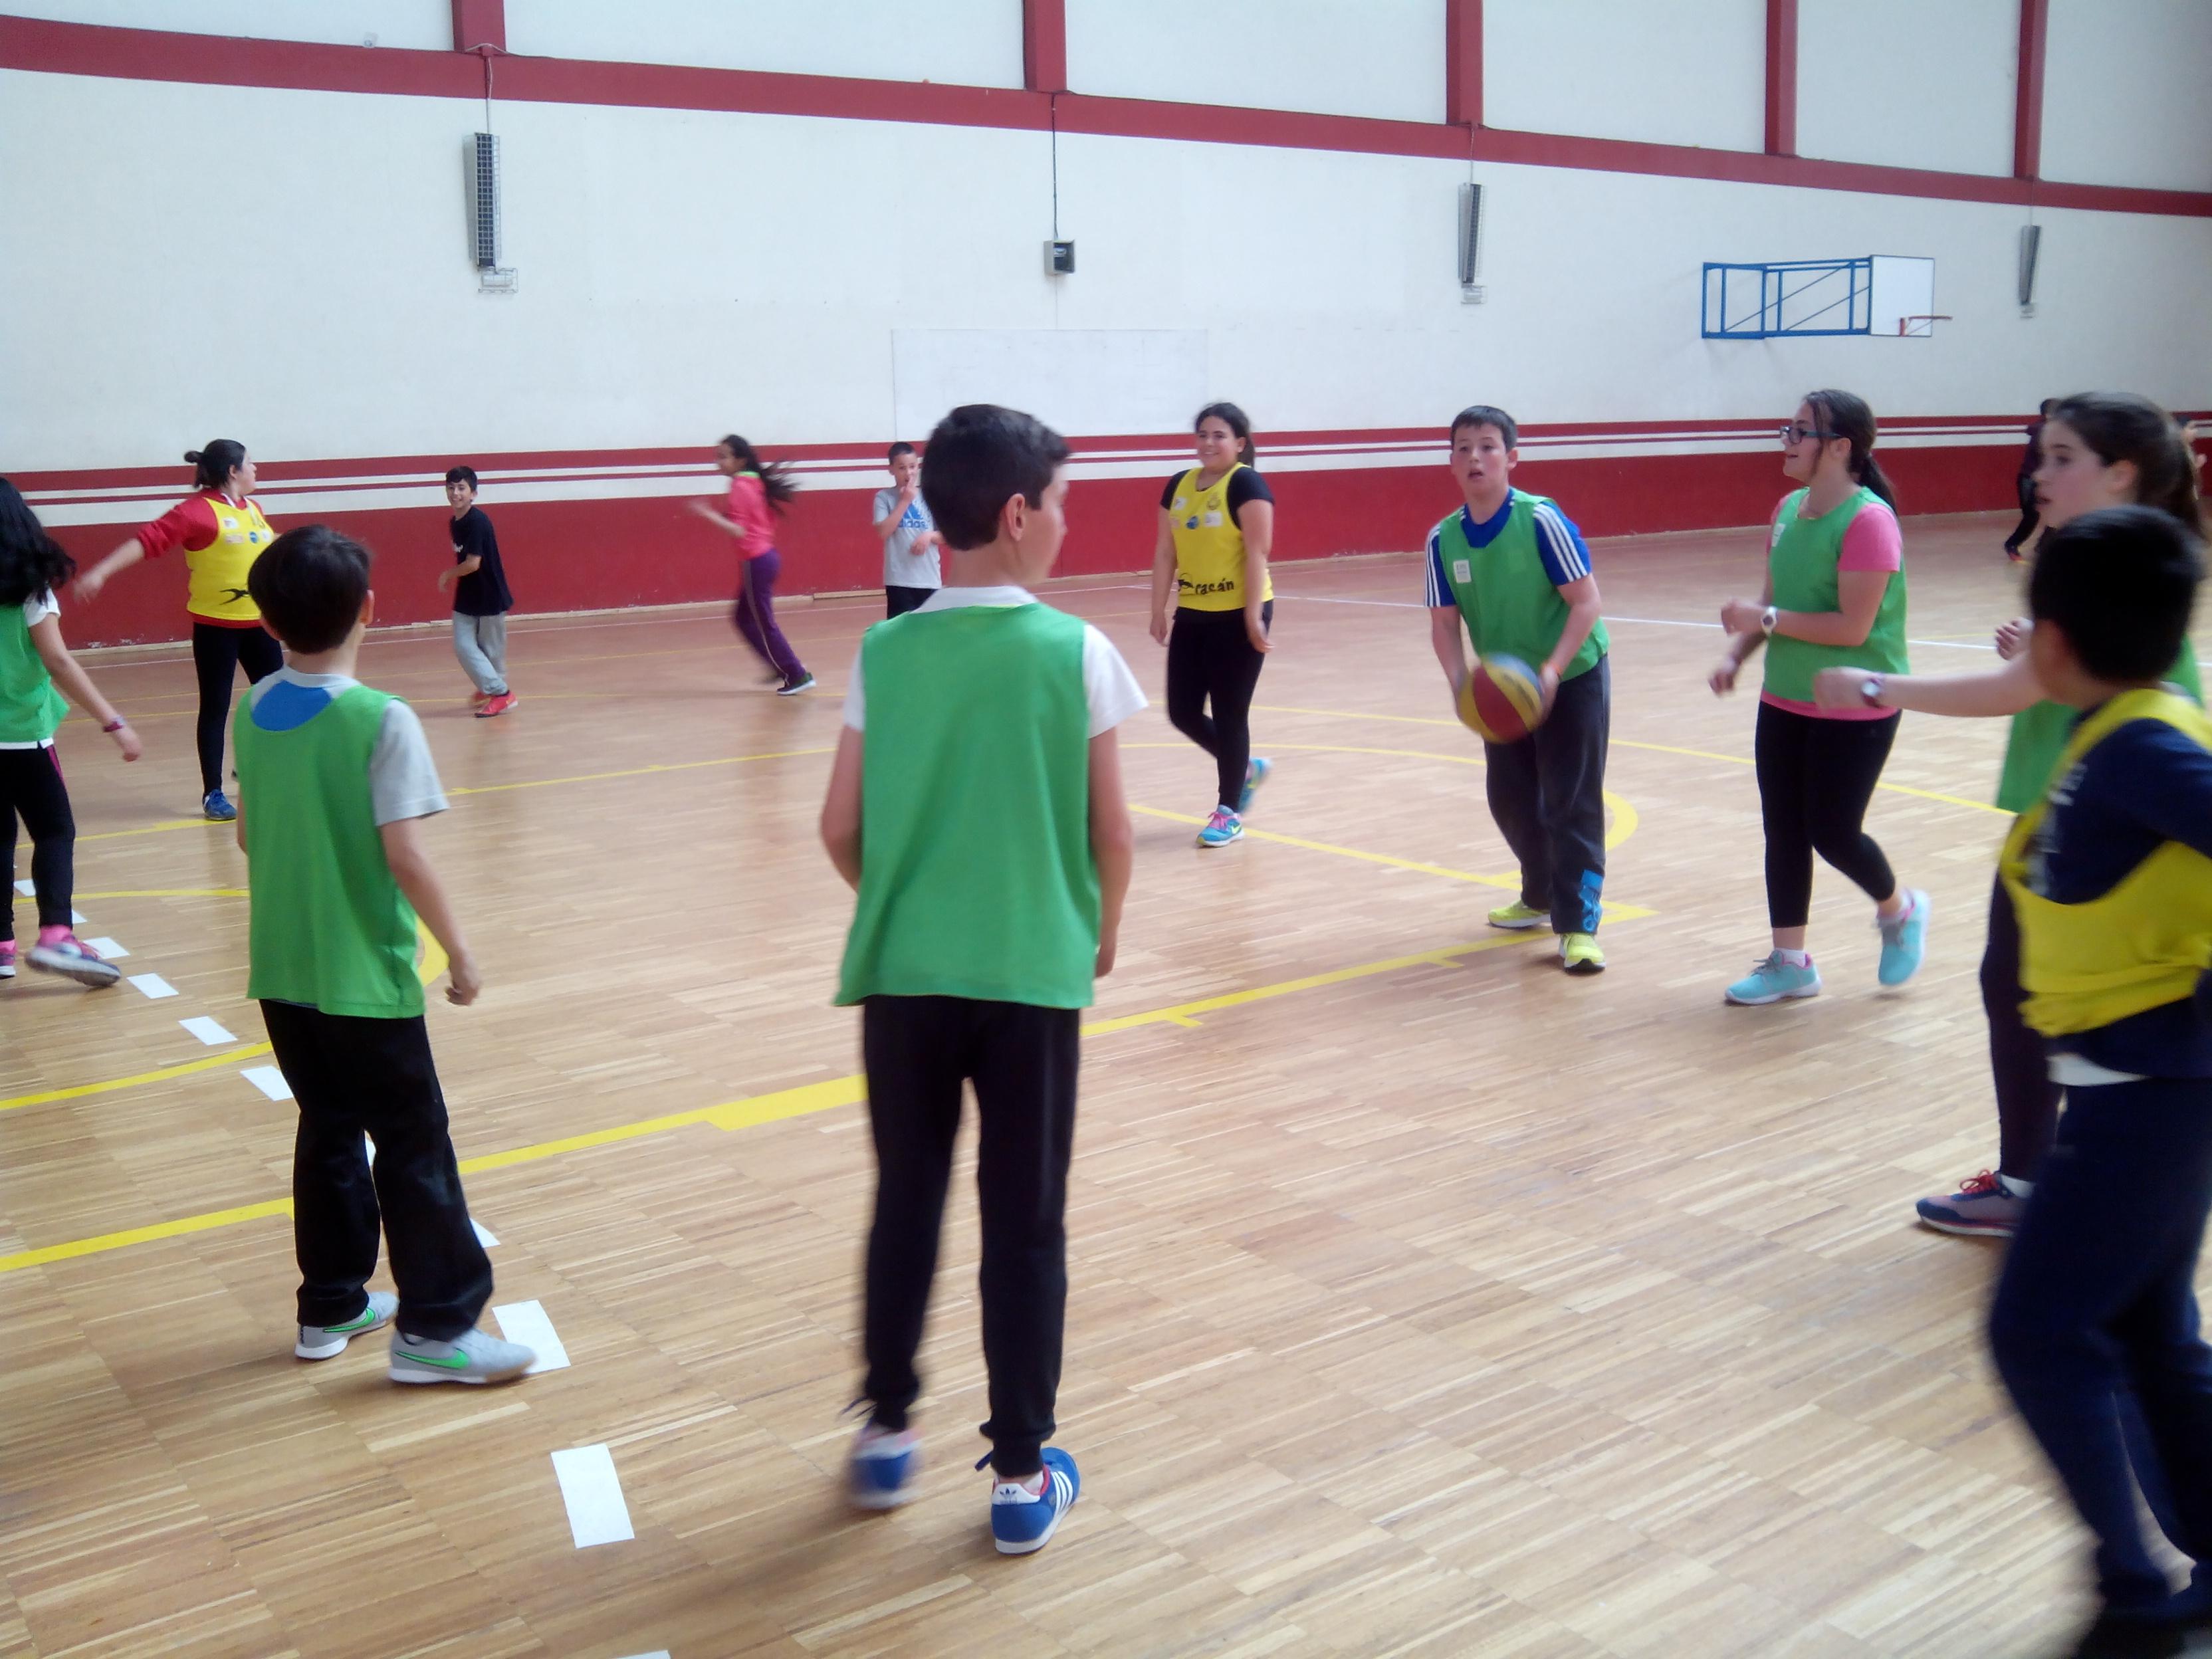 Baloncesto 2016 cp otero de navascu s - Colegio otero de navascues ...